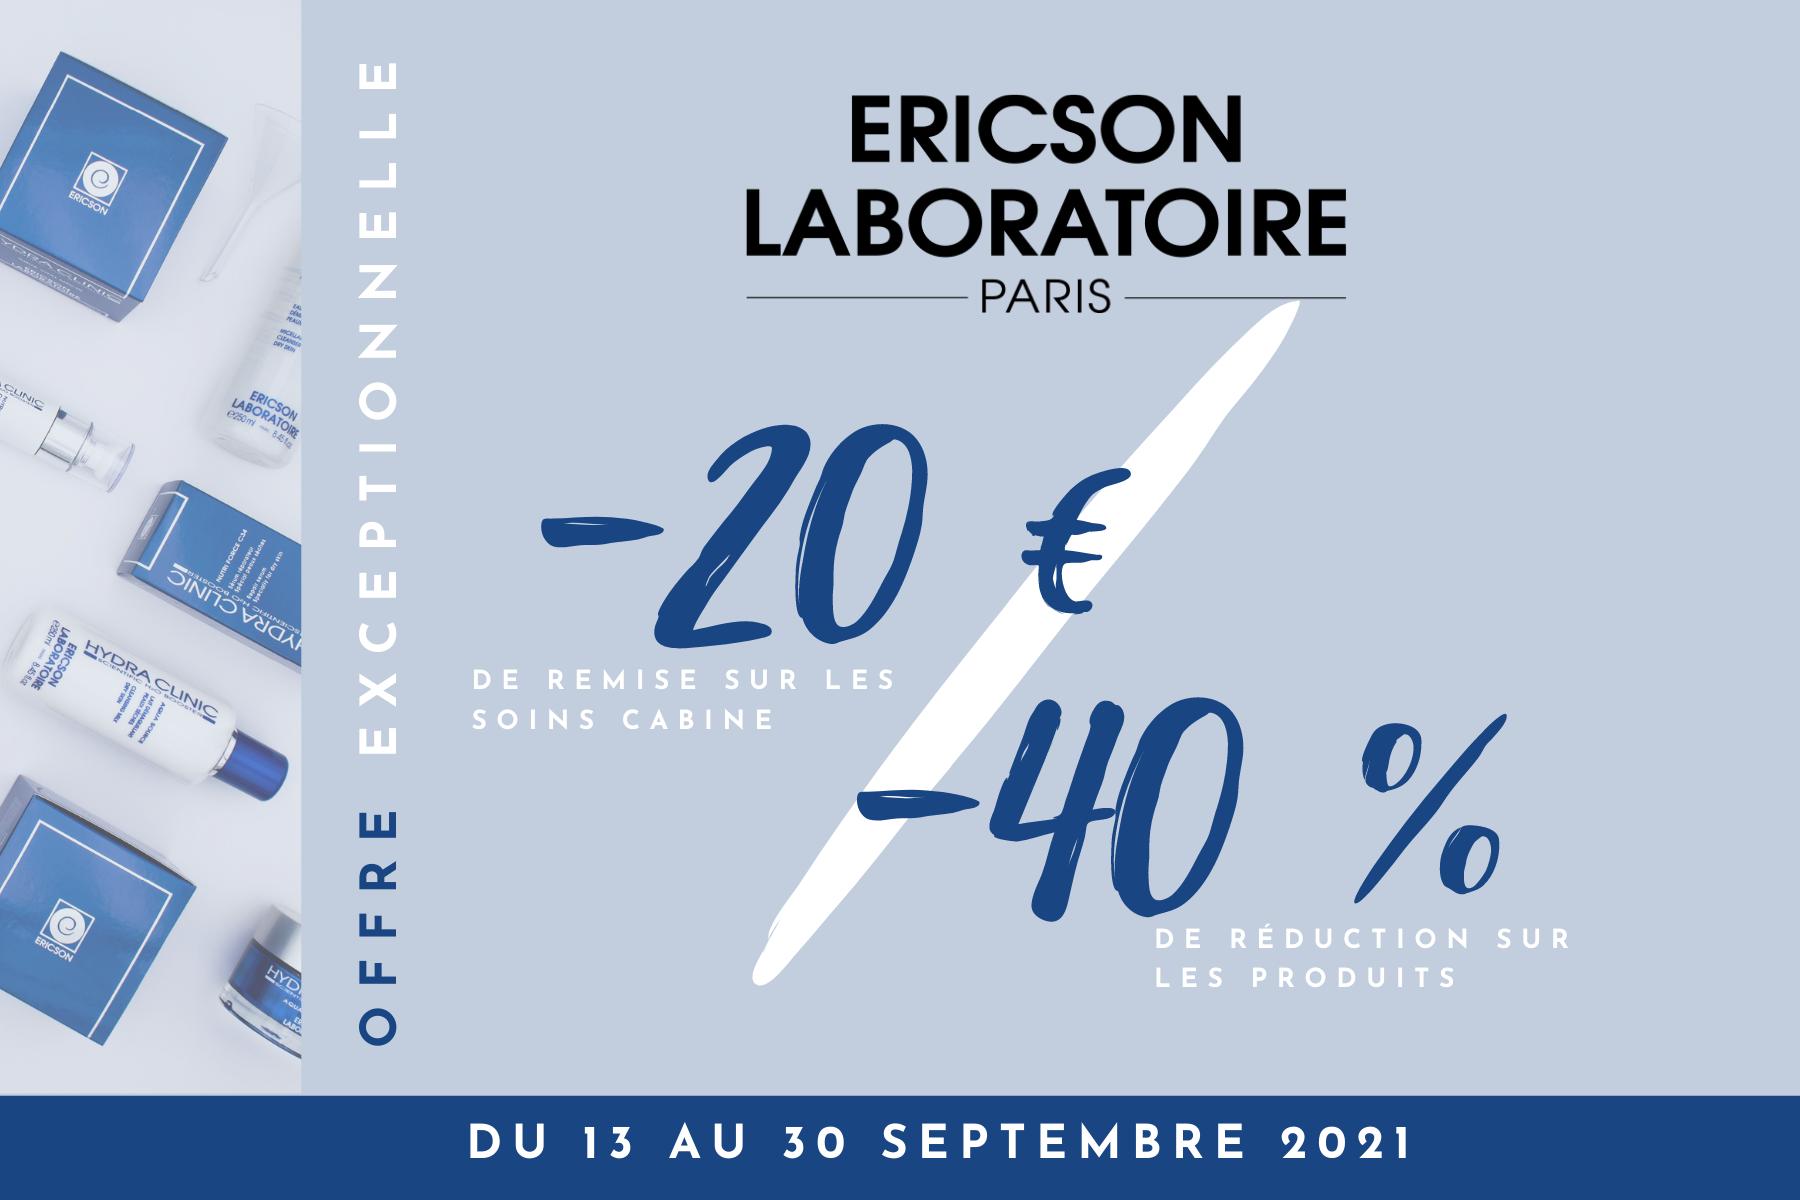 coupon ericson laboratoire promo septembre 2021